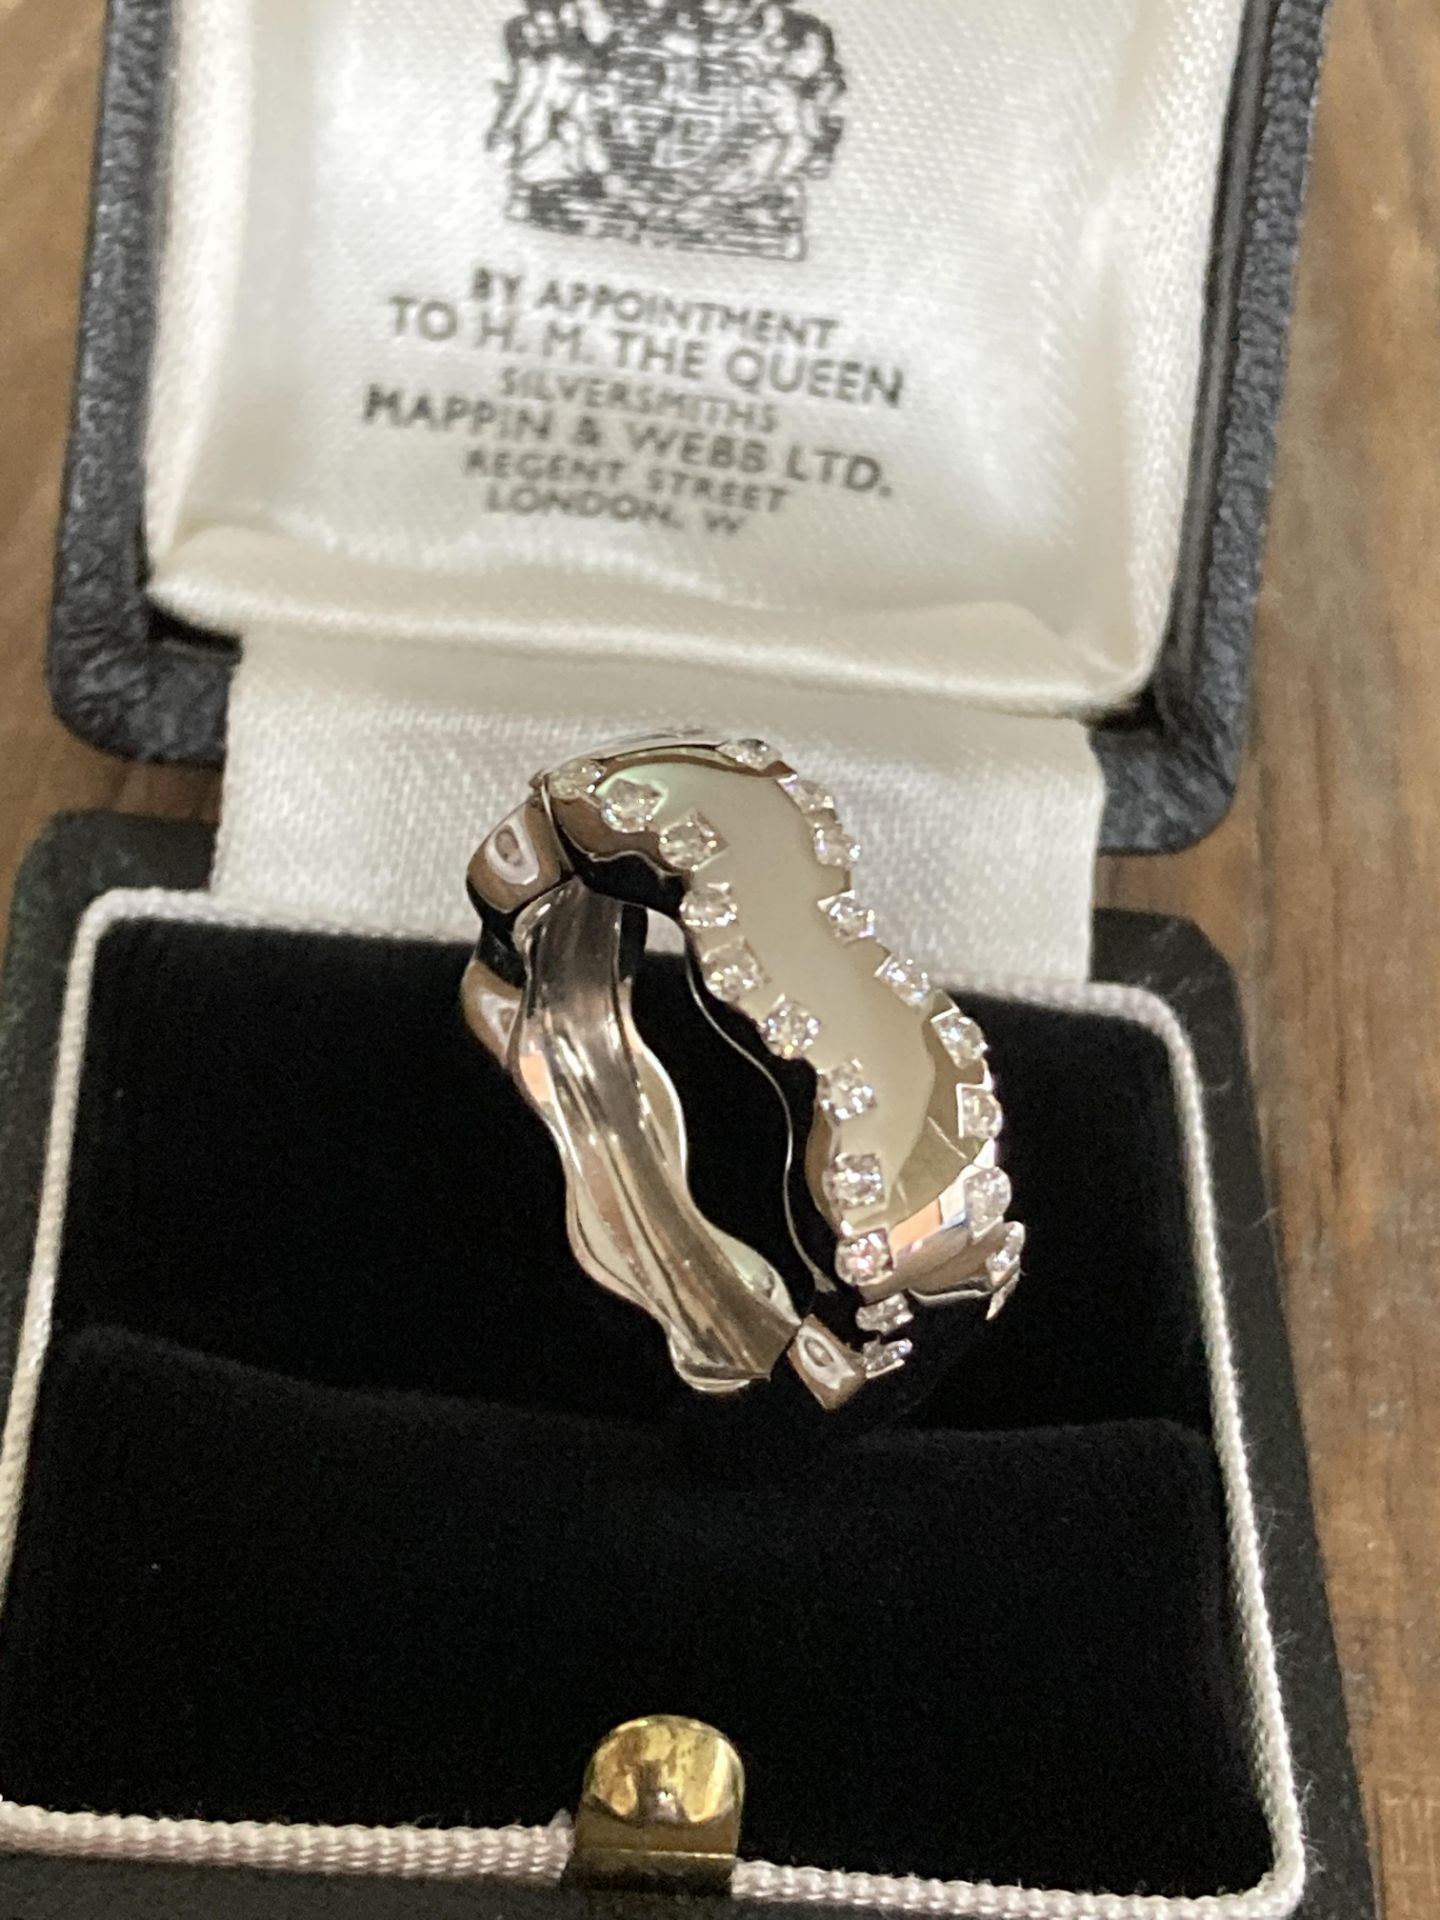 MODERN 18CT WHITE GOLD DIAMOND RING - 0.65CT / SIZE: N, WEIGHT: 11.4G - Image 3 of 4